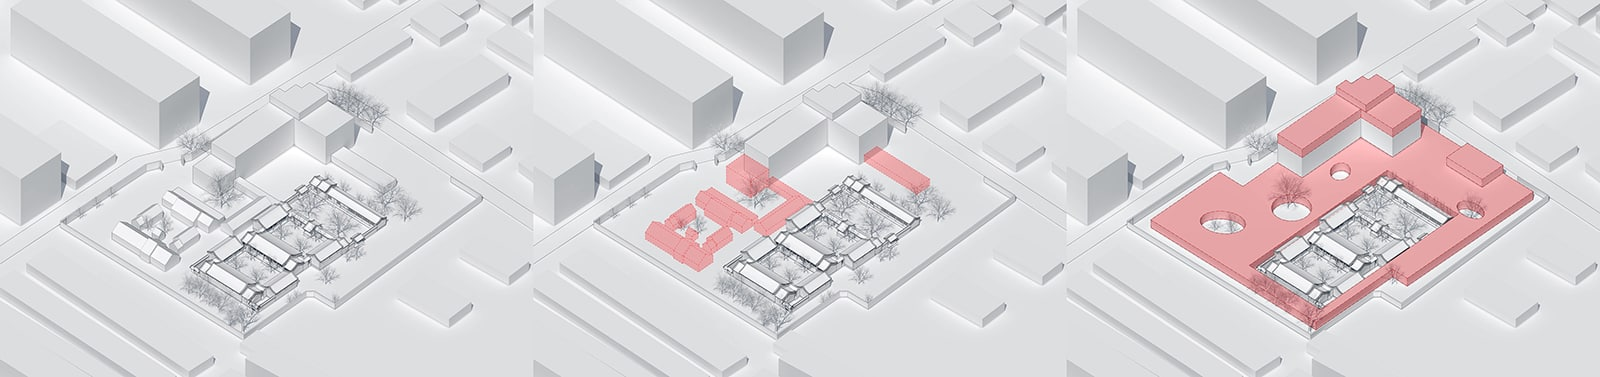 Yuecheng Courtyard Kindergarten  - 16 71